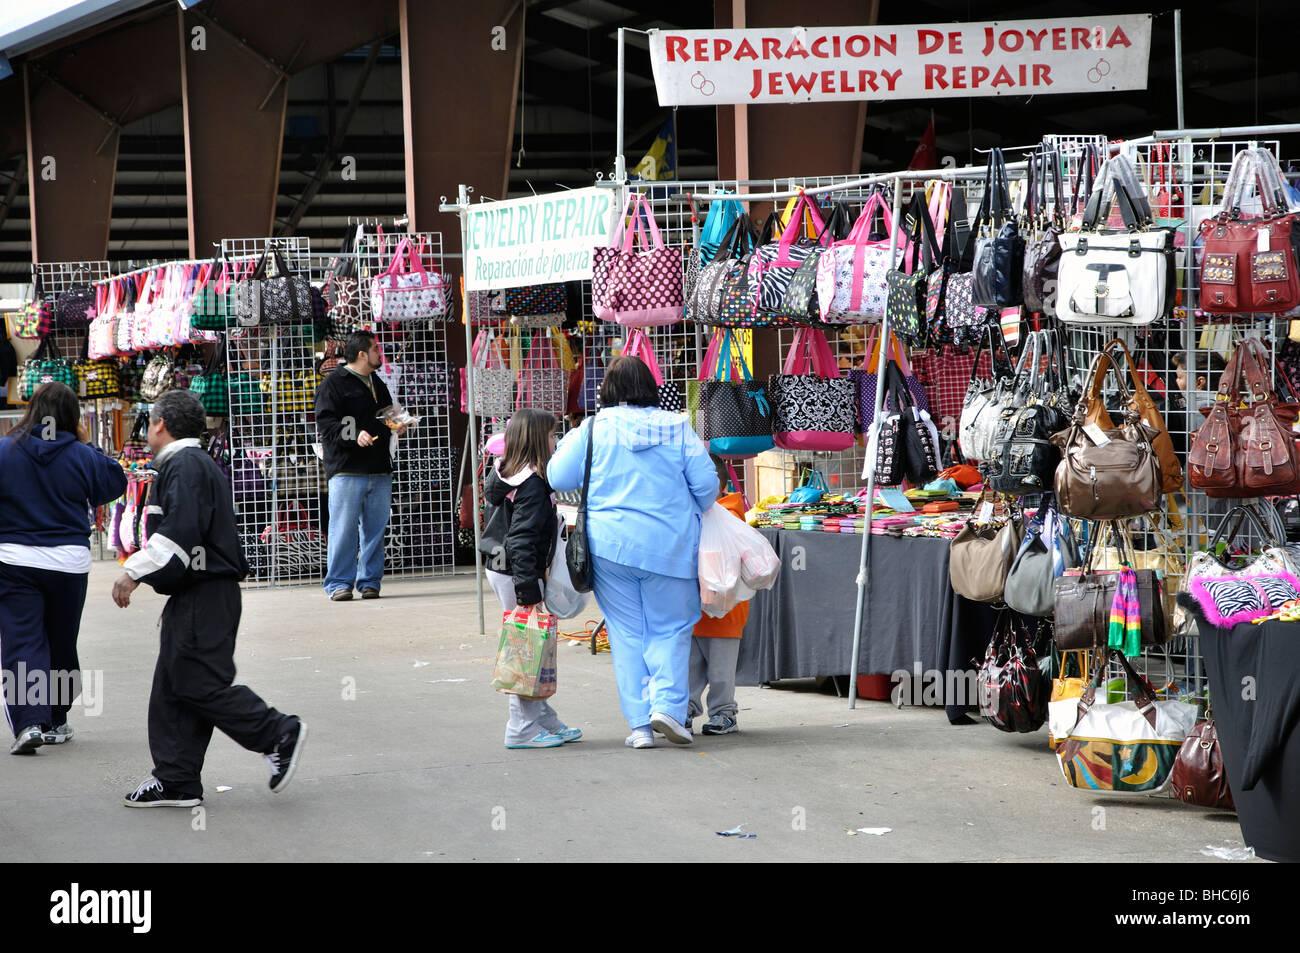 dfbda61088 Fake designer handbags on sale at Traders Village - biggest flea market in  Texas, Grand Prairie, TX, USA